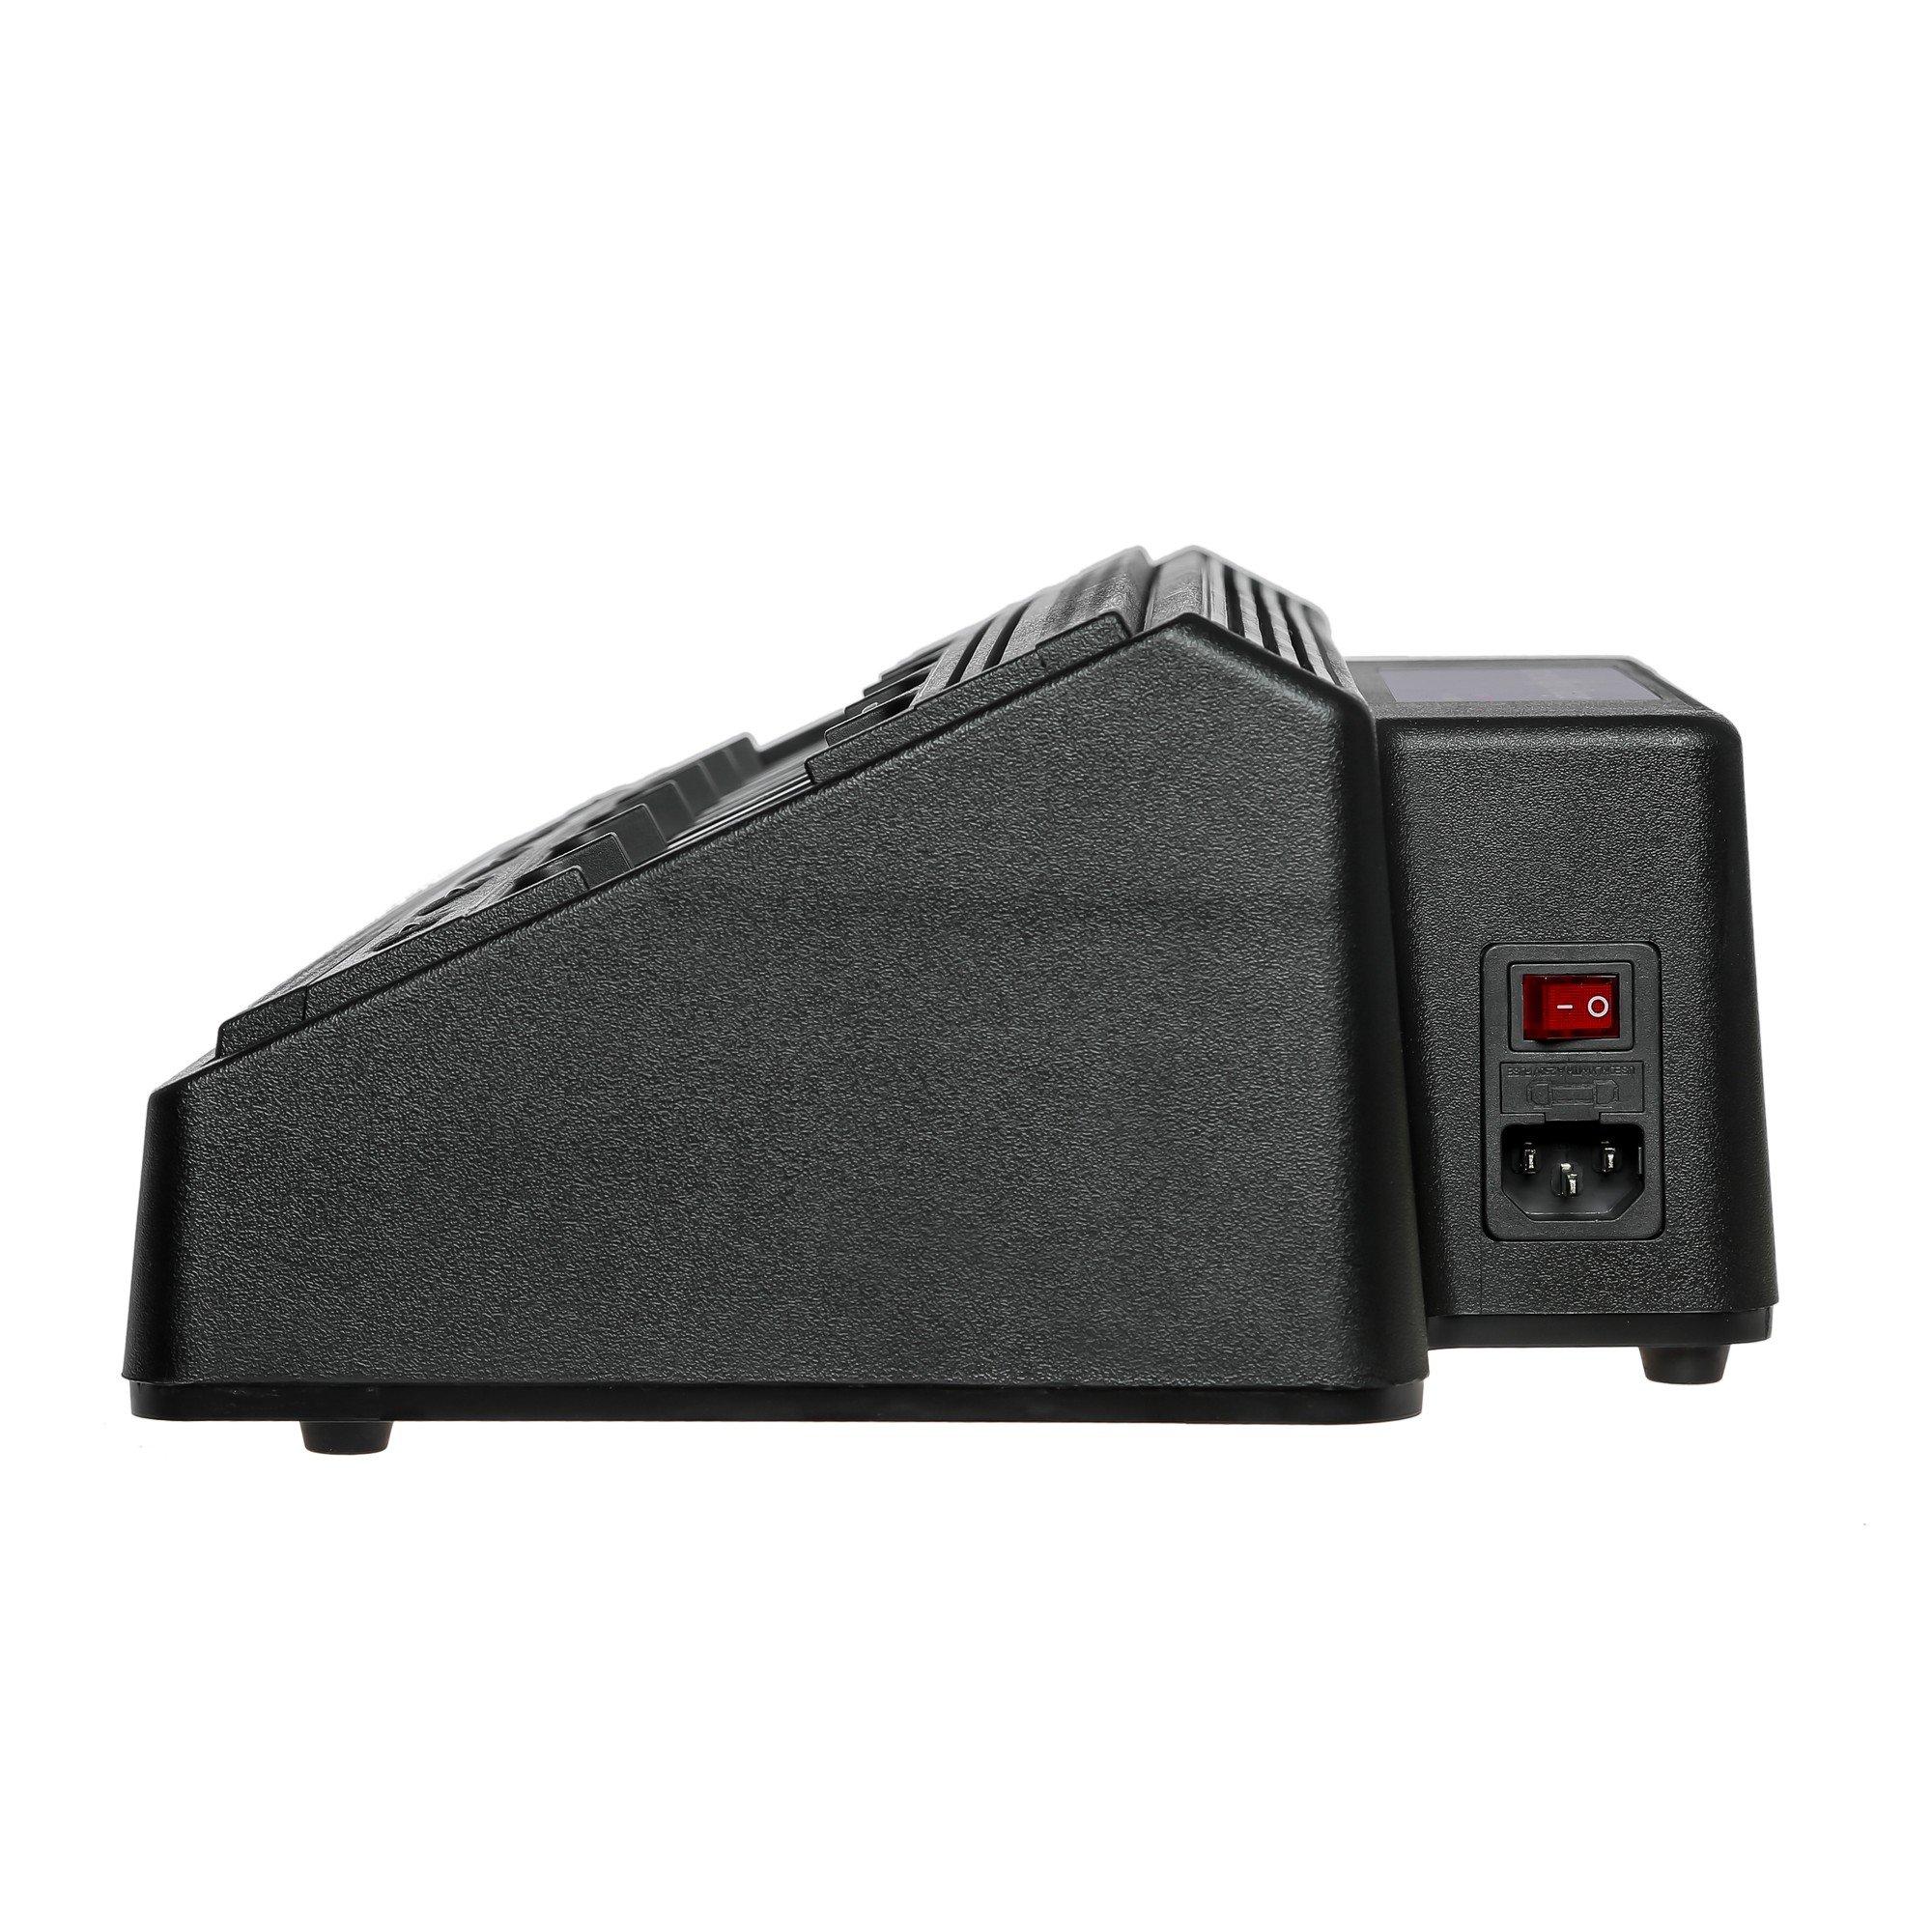 Maxtop AM6R4232-120-V3 Six Unit Bank Rapid Charger for Motorola DR3000 DP3400 DP3401 DP3600 DP3601 DGP4150 DGP4150+ by MAXTOP (Image #3)